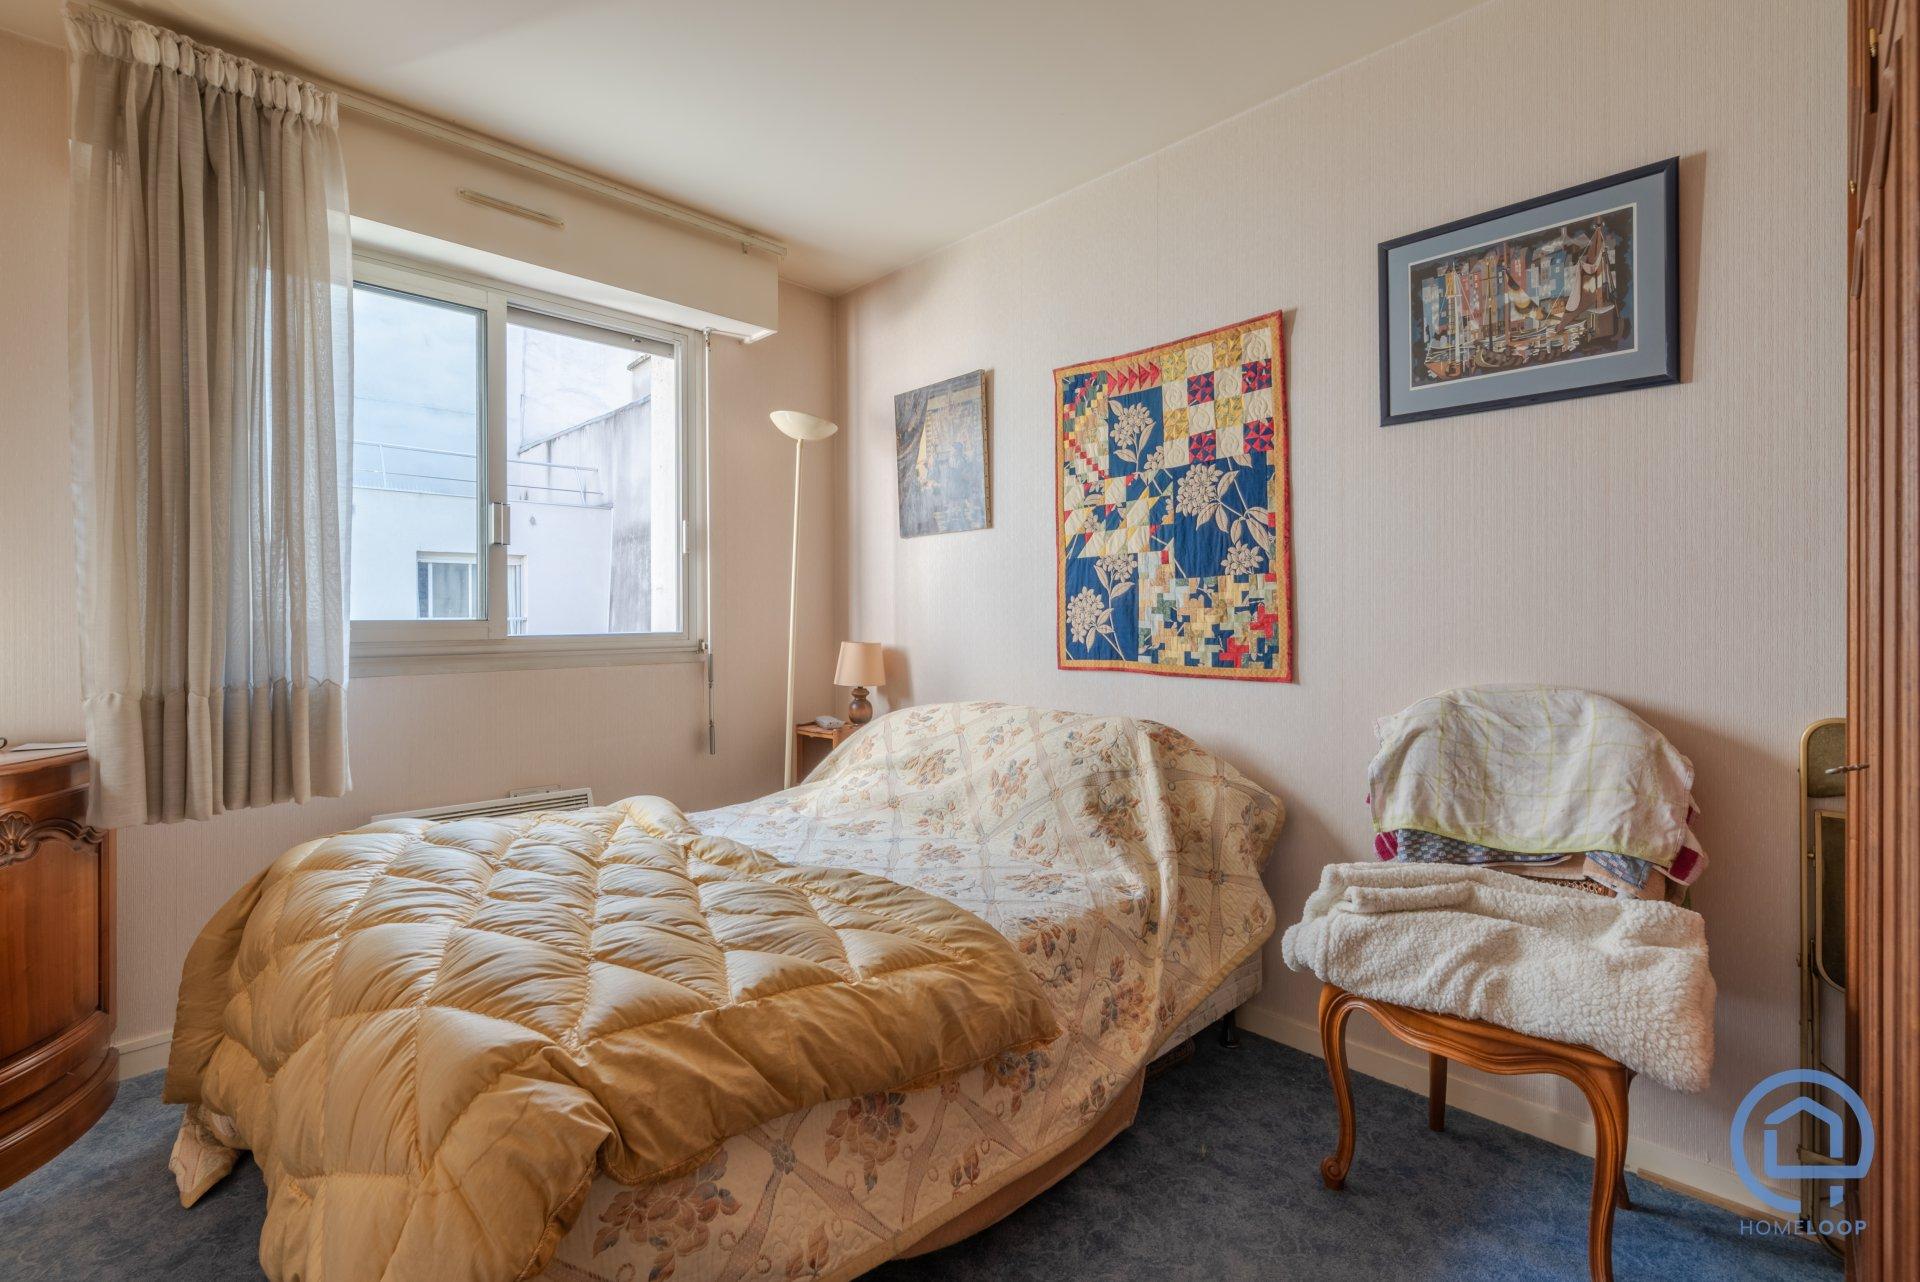 Vente Appartement - Paris 12ème Picpus